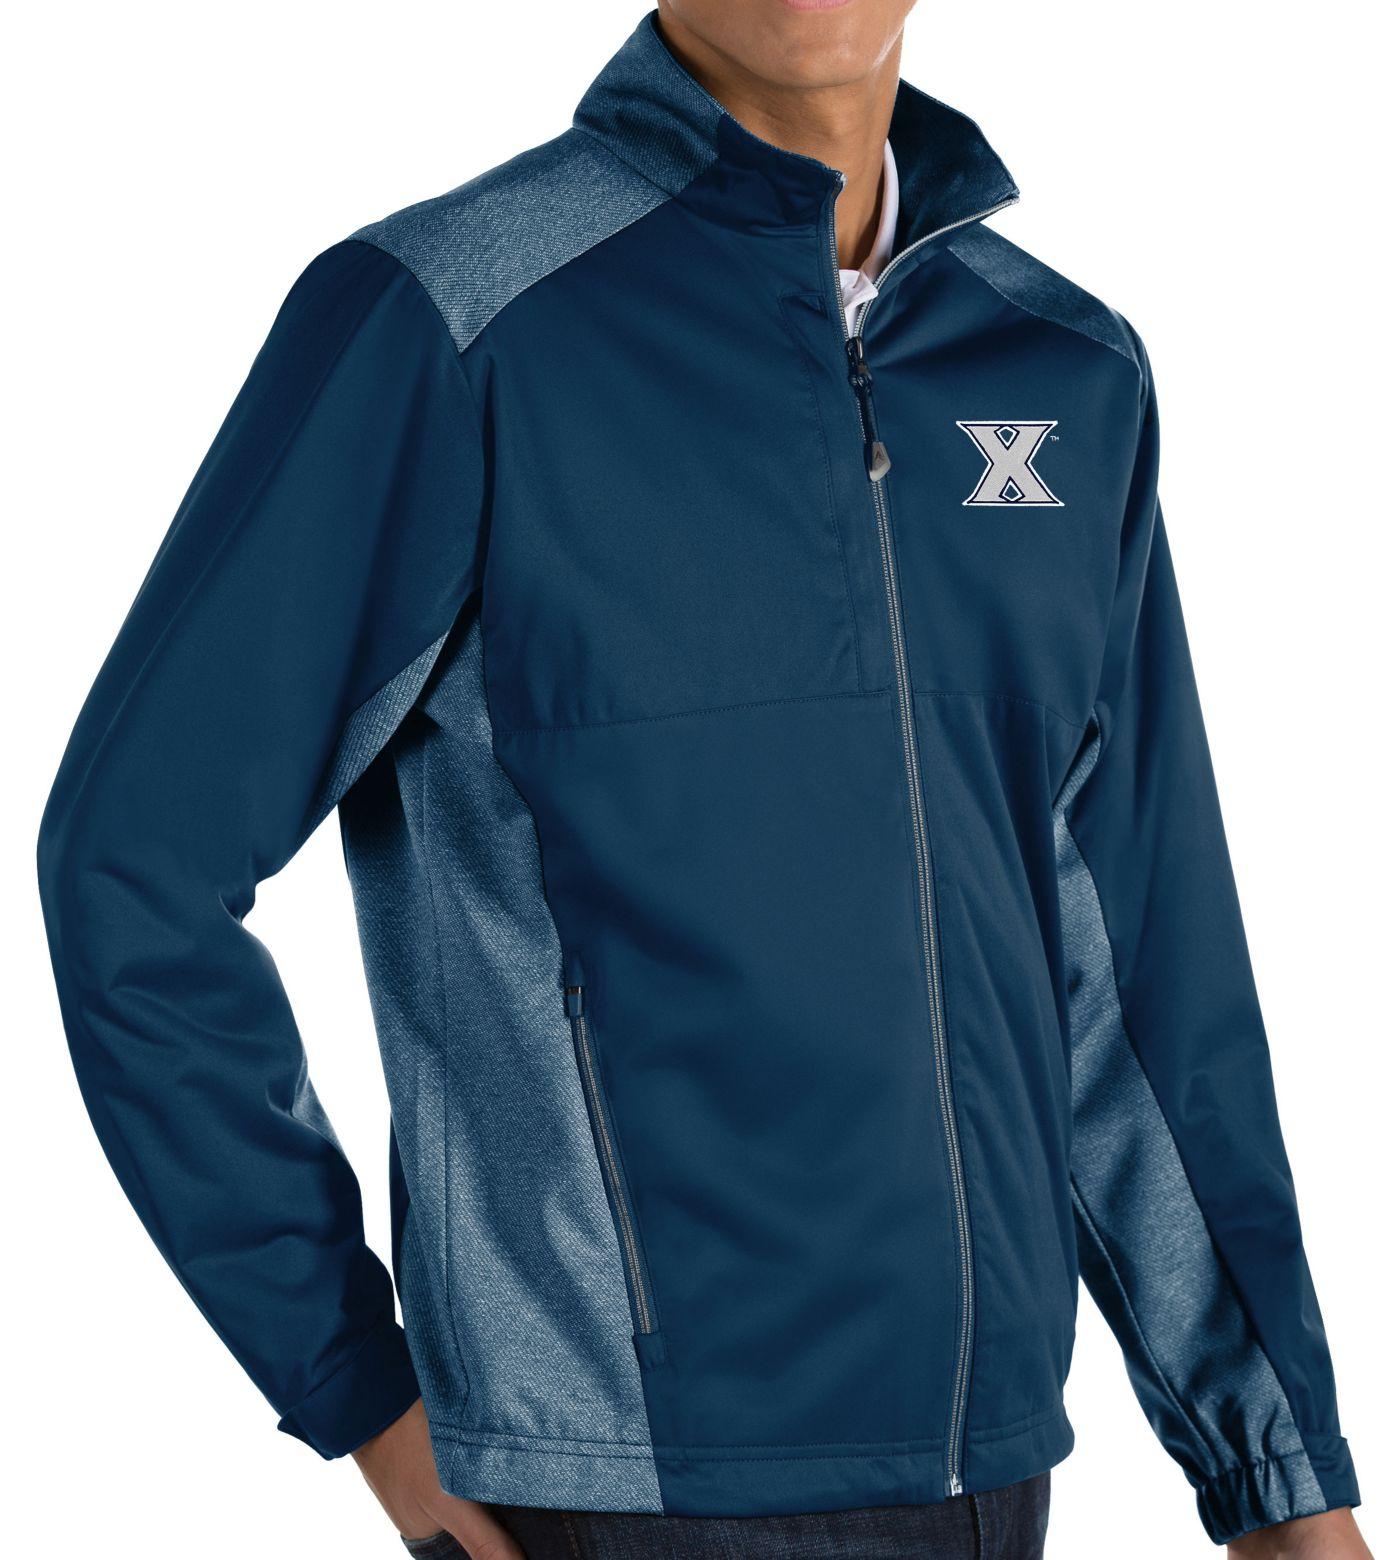 Antigua Men's Xavier Musketeers Blue Revolve Full-Zip Jacket